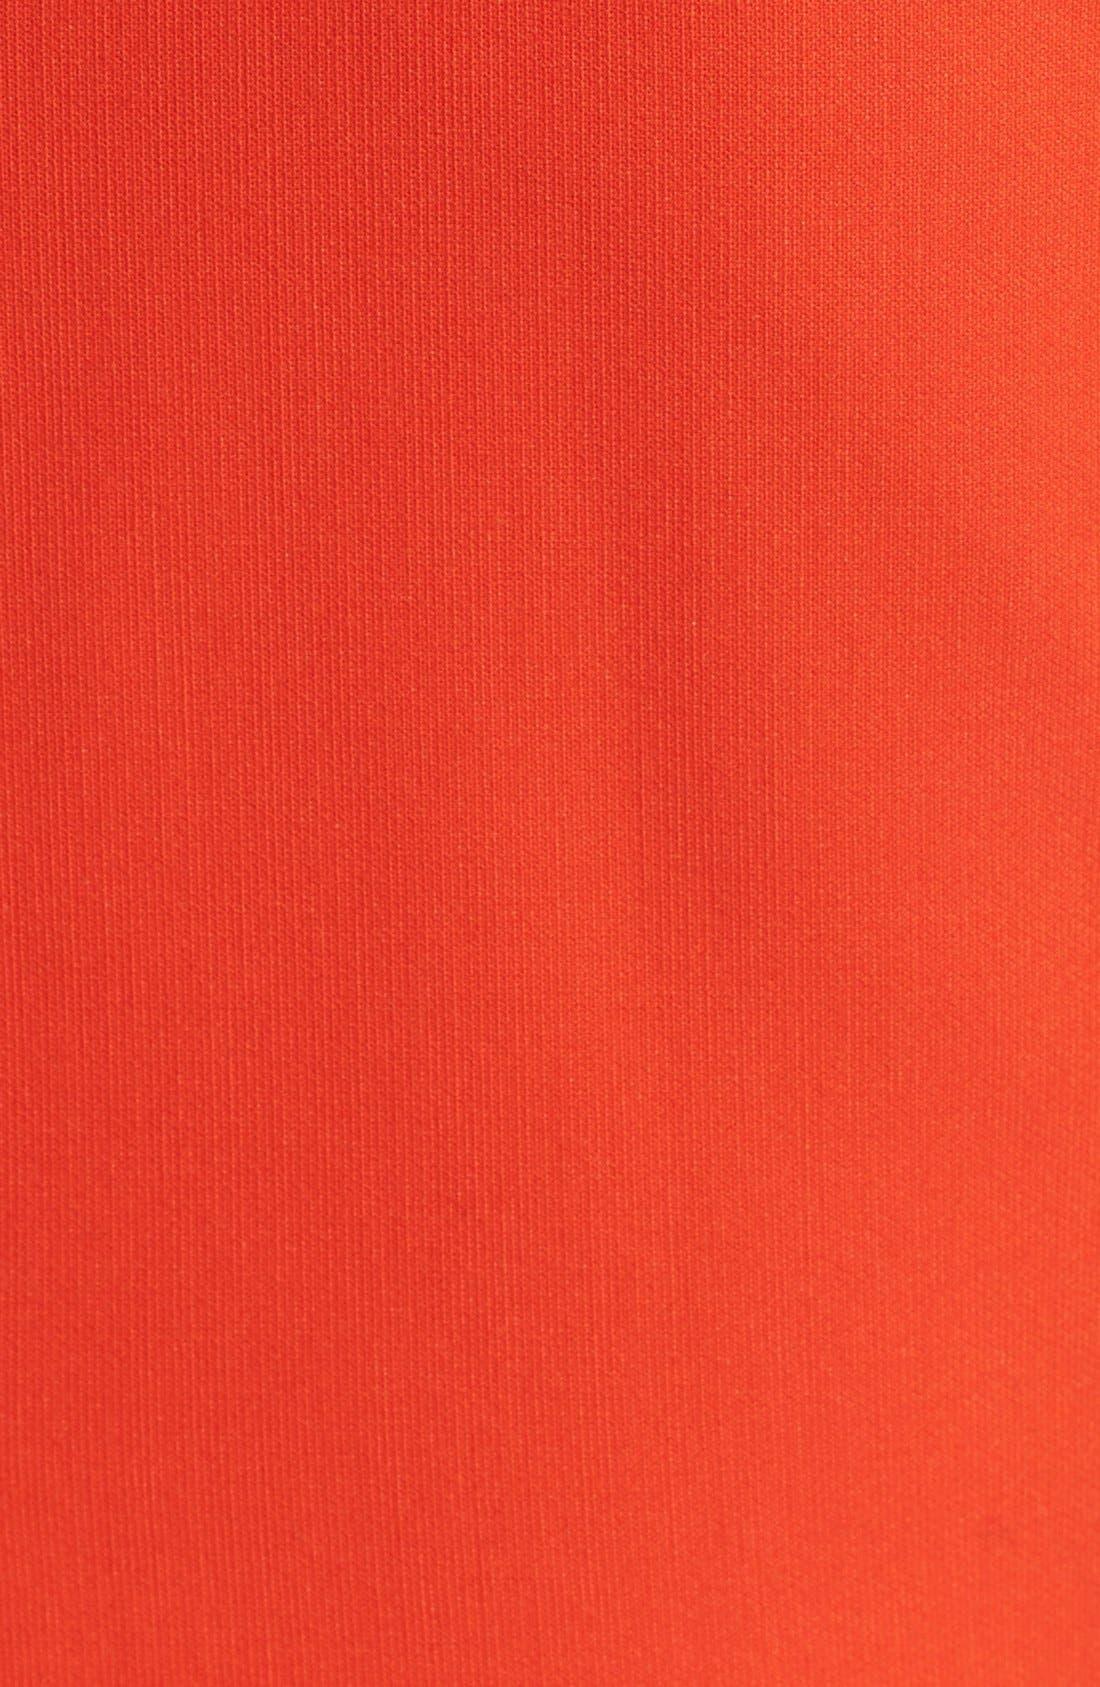 'Elle' Fit & Flare Racerback Dress,                             Alternate thumbnail 2, color,                             843